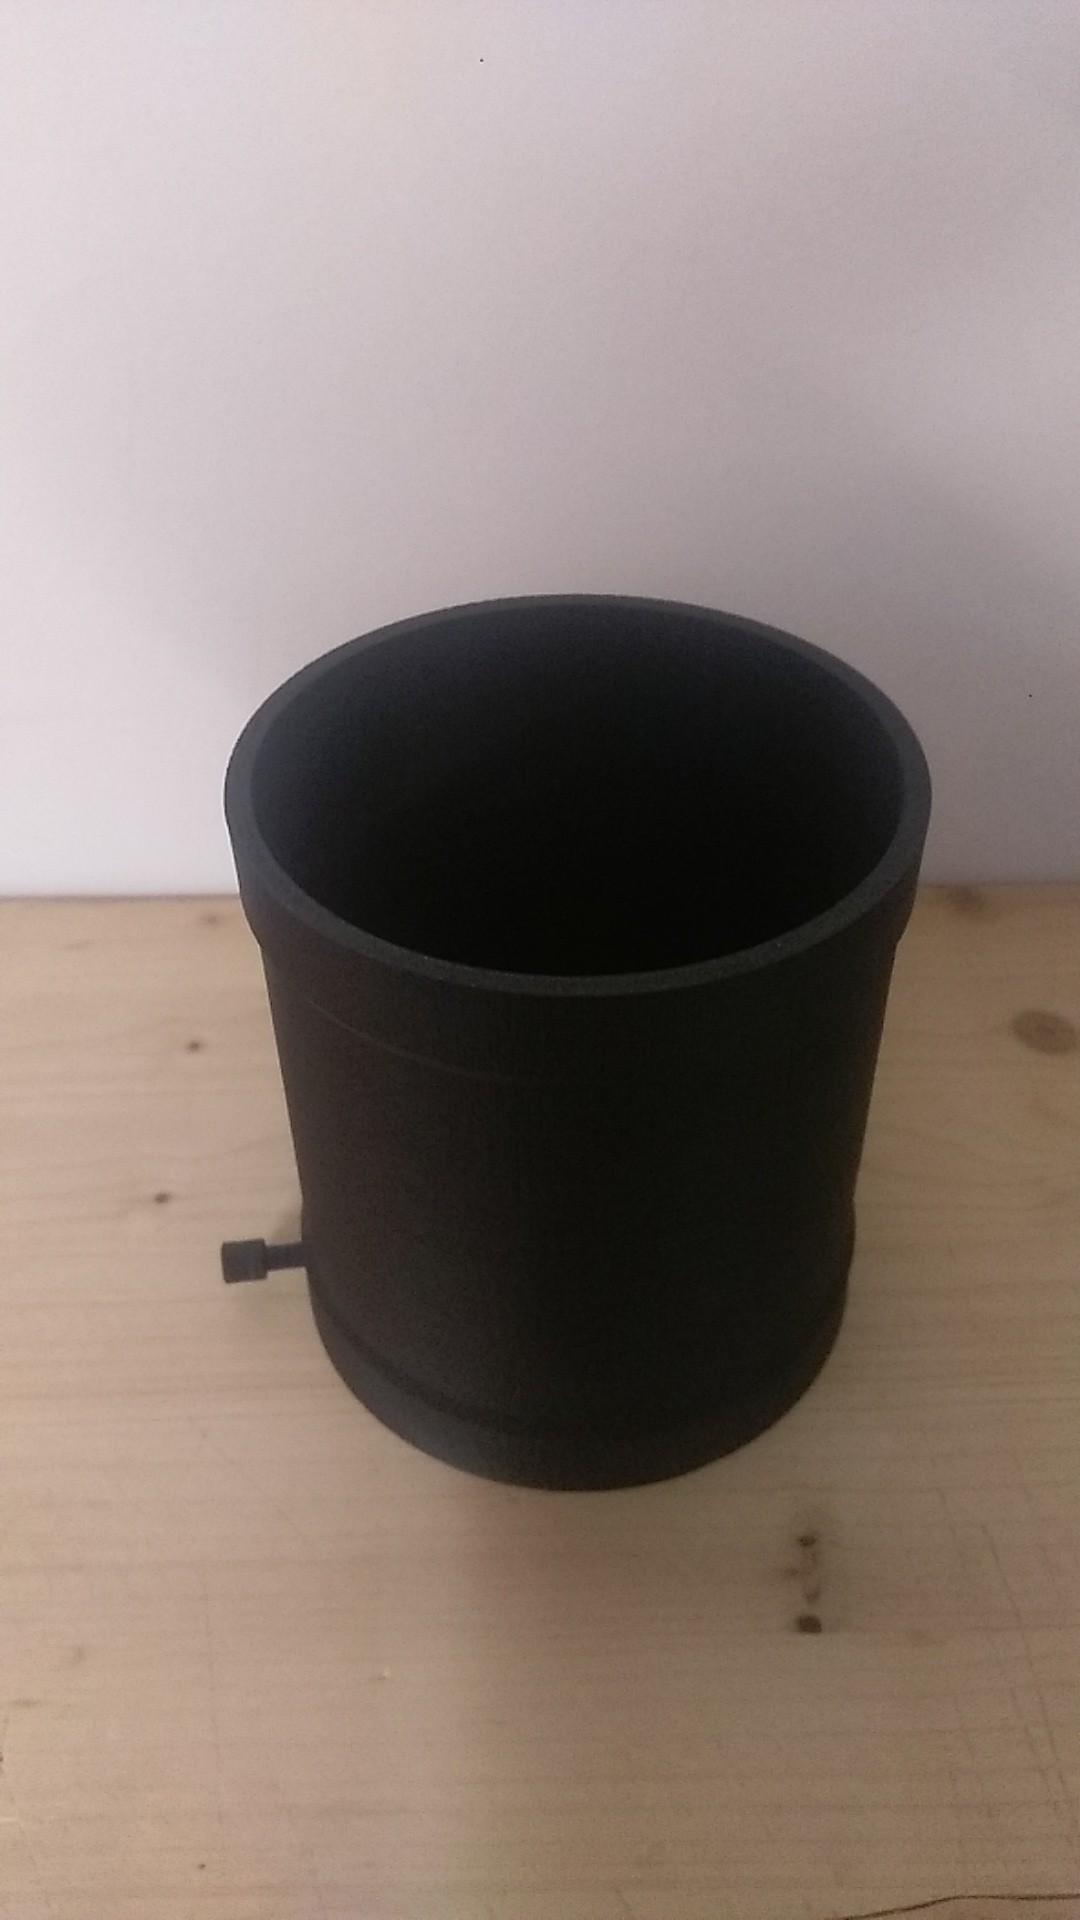 IMAG0974.jpg Download free STL file NIkon Camera Extension Tube • 3D printing object, ProType3D